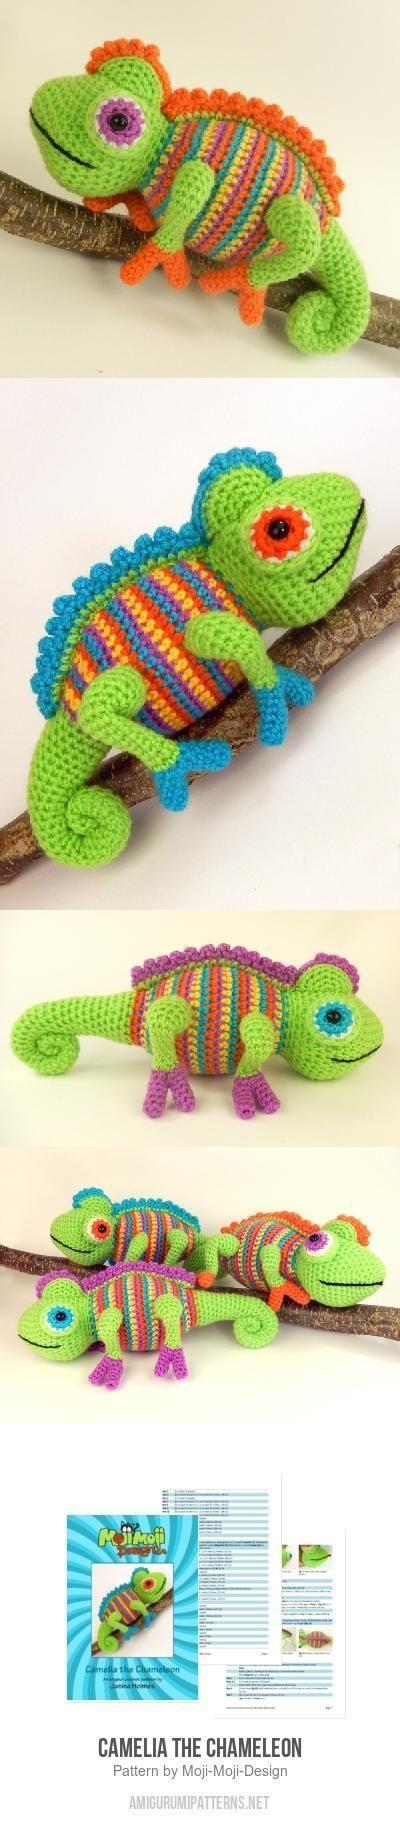 Crochet Chameleon Amigurumi Super Cute Chameleons Amigurumi And